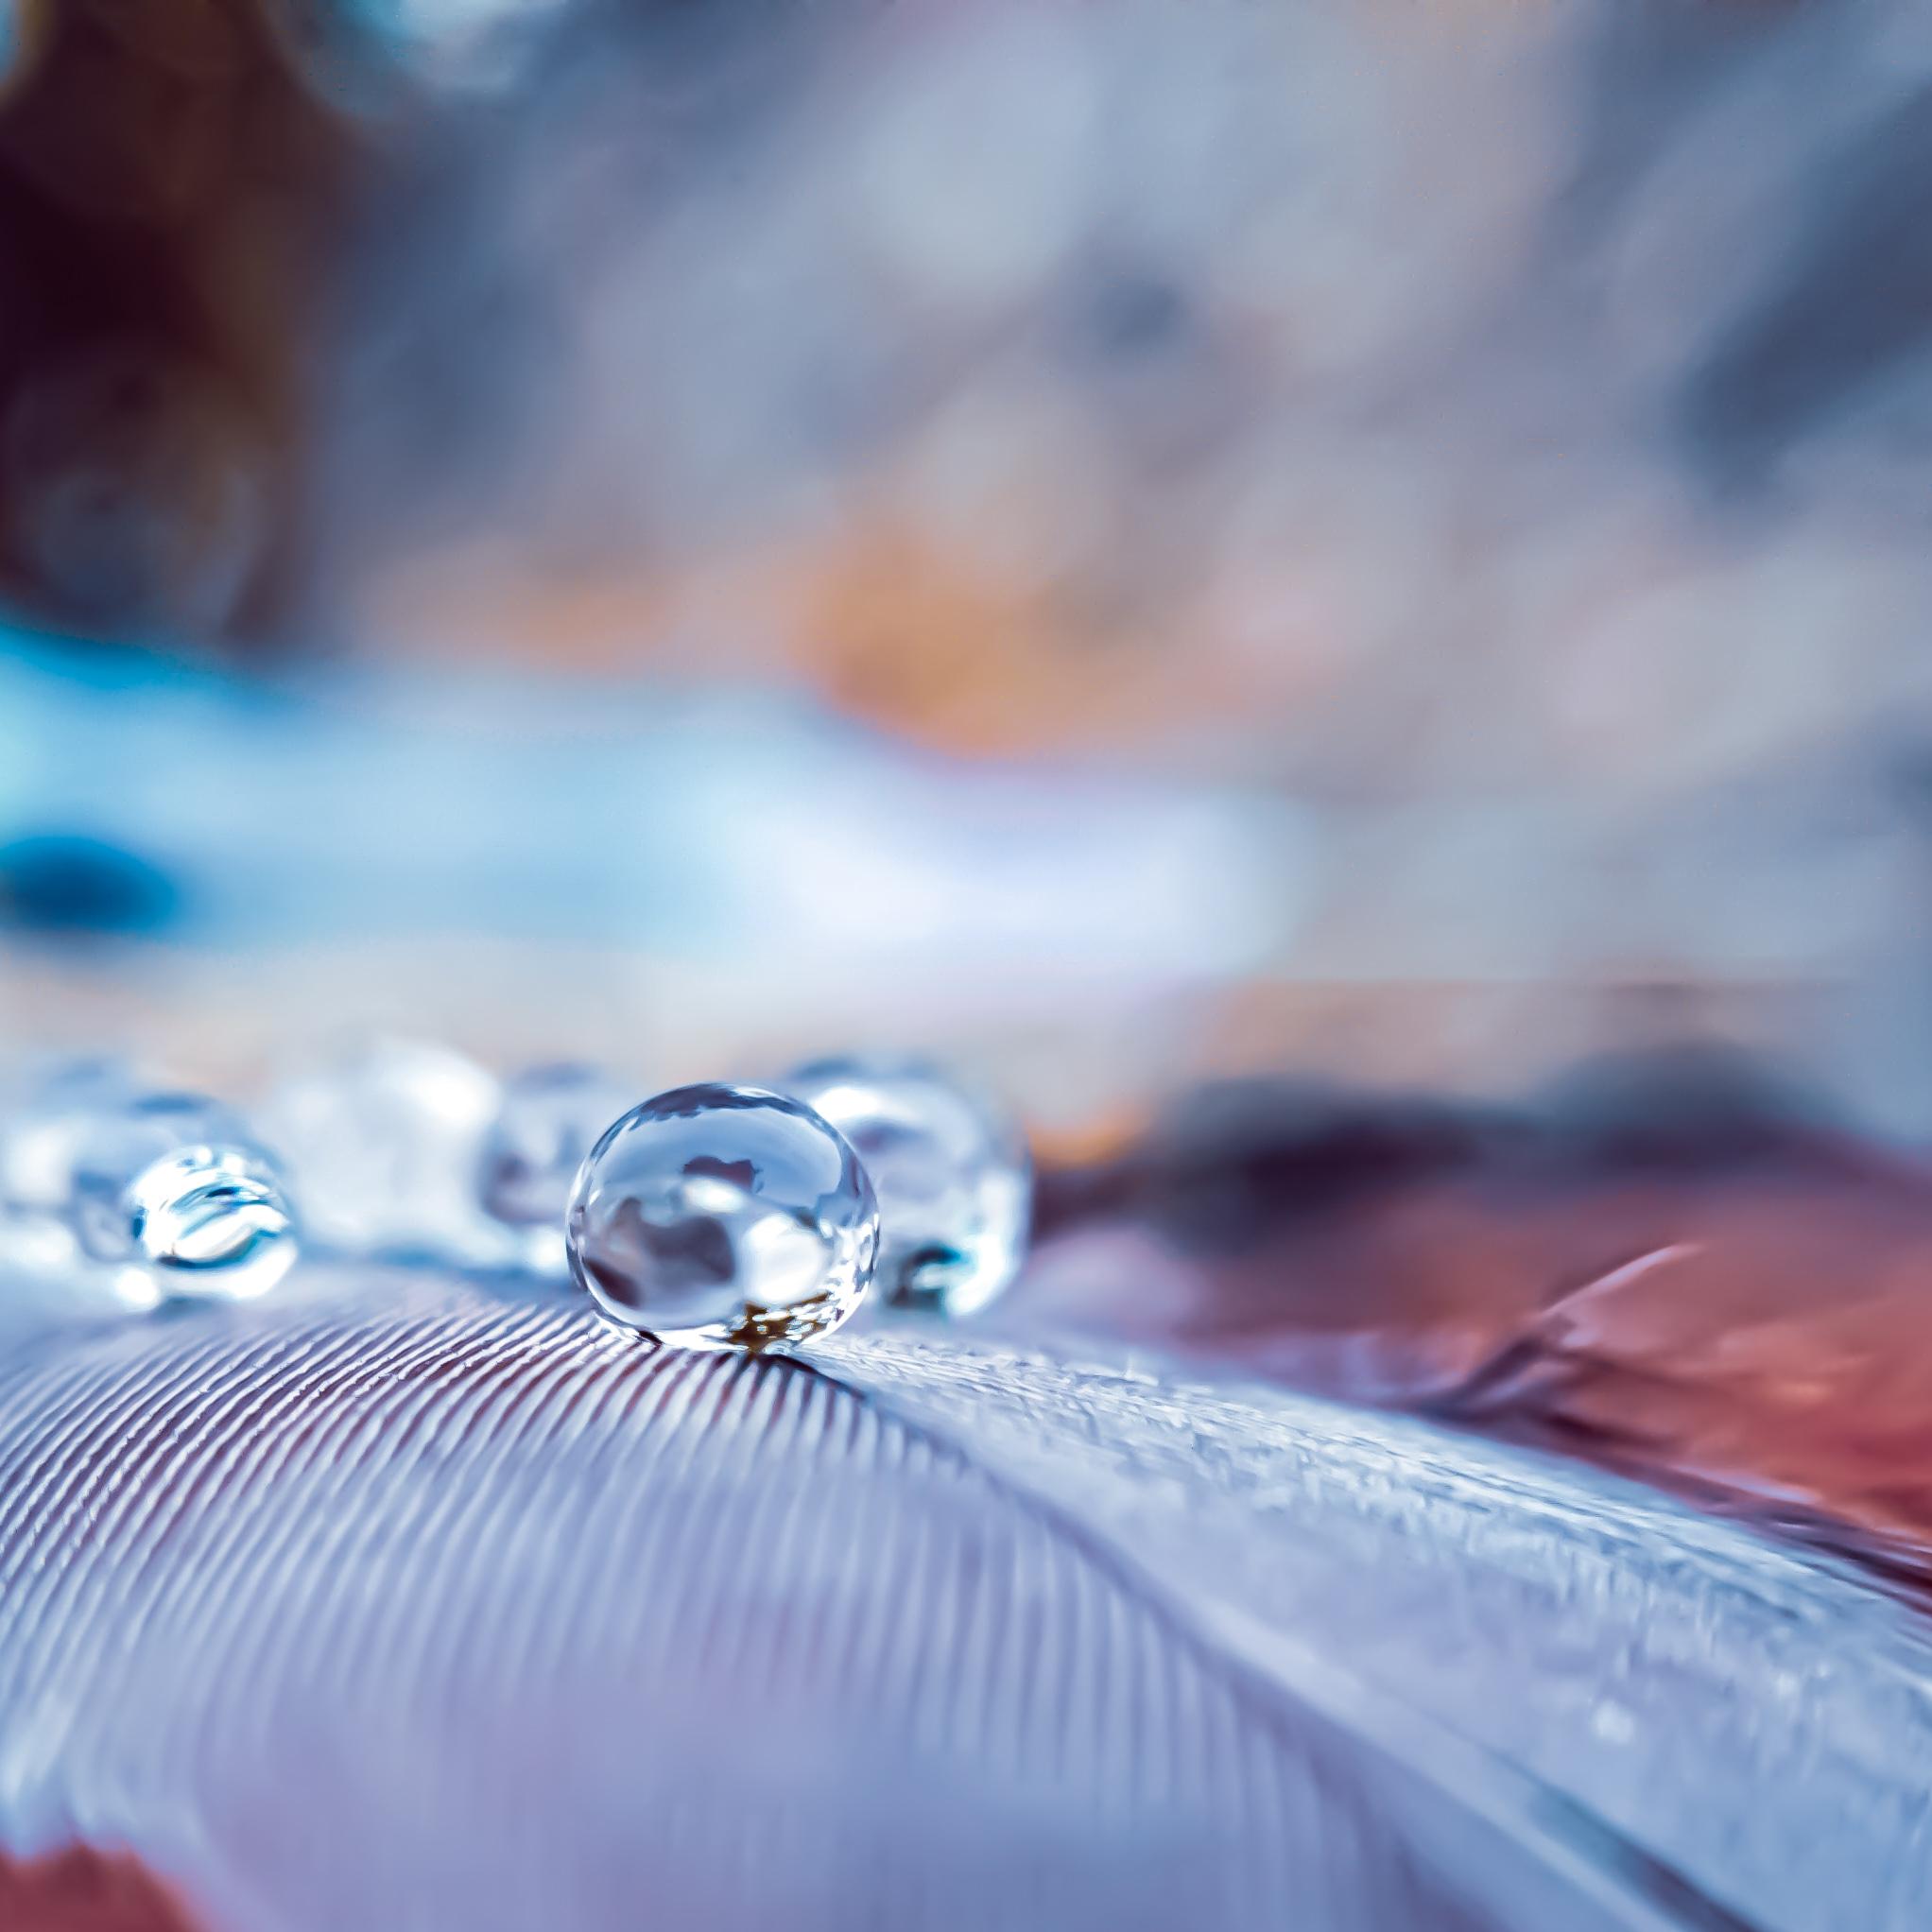 Droplet on Focus